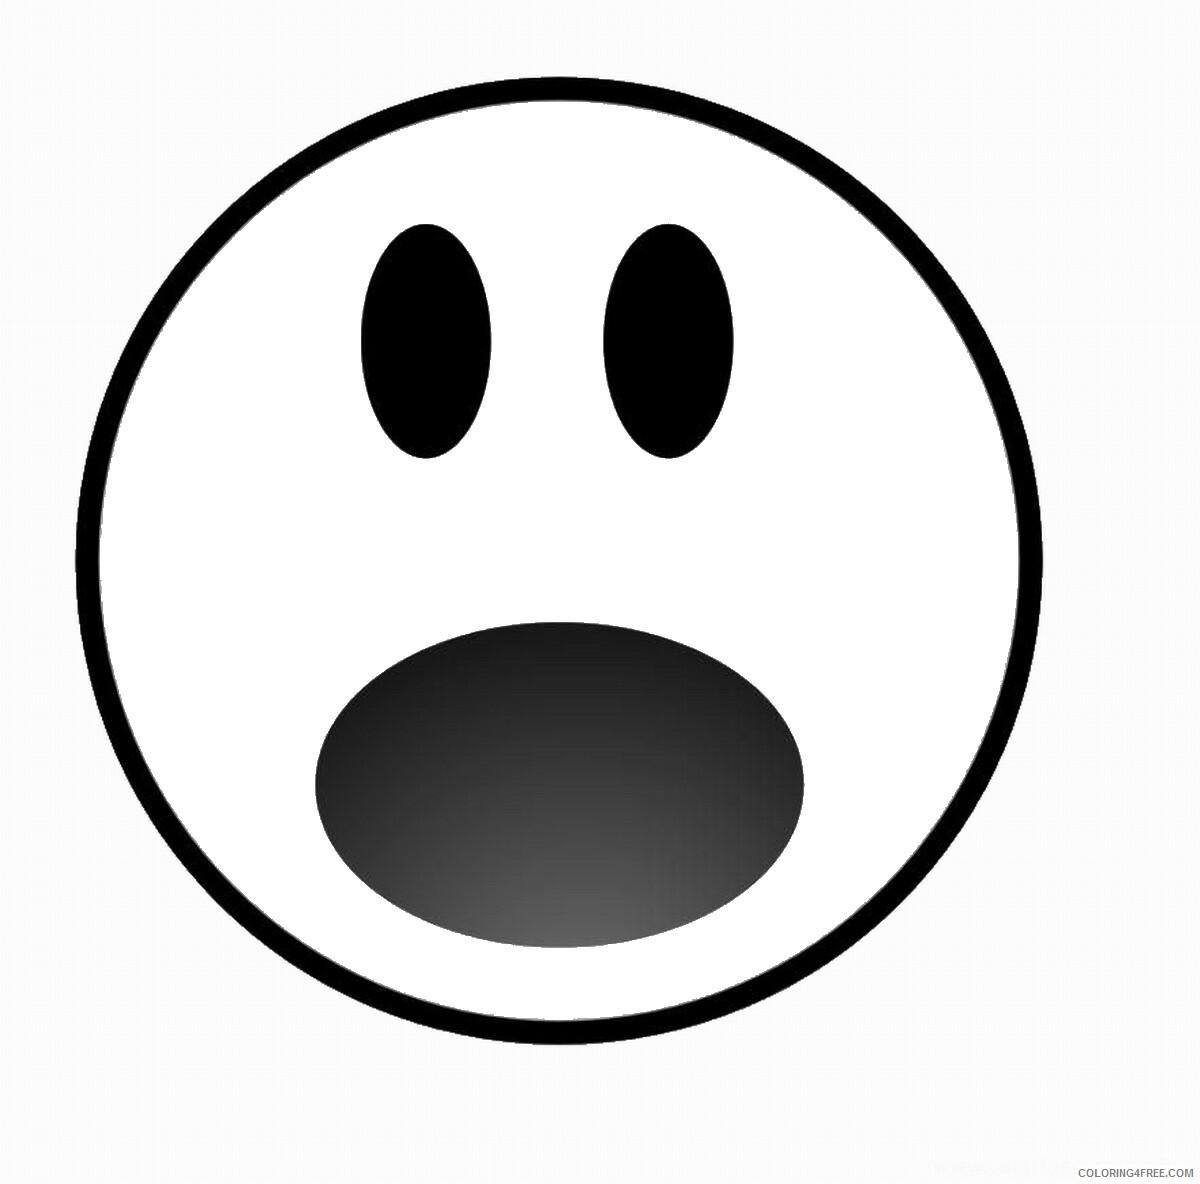 Emoji Coloring Pages emoji7 Printable 2021 2172 Coloring4free